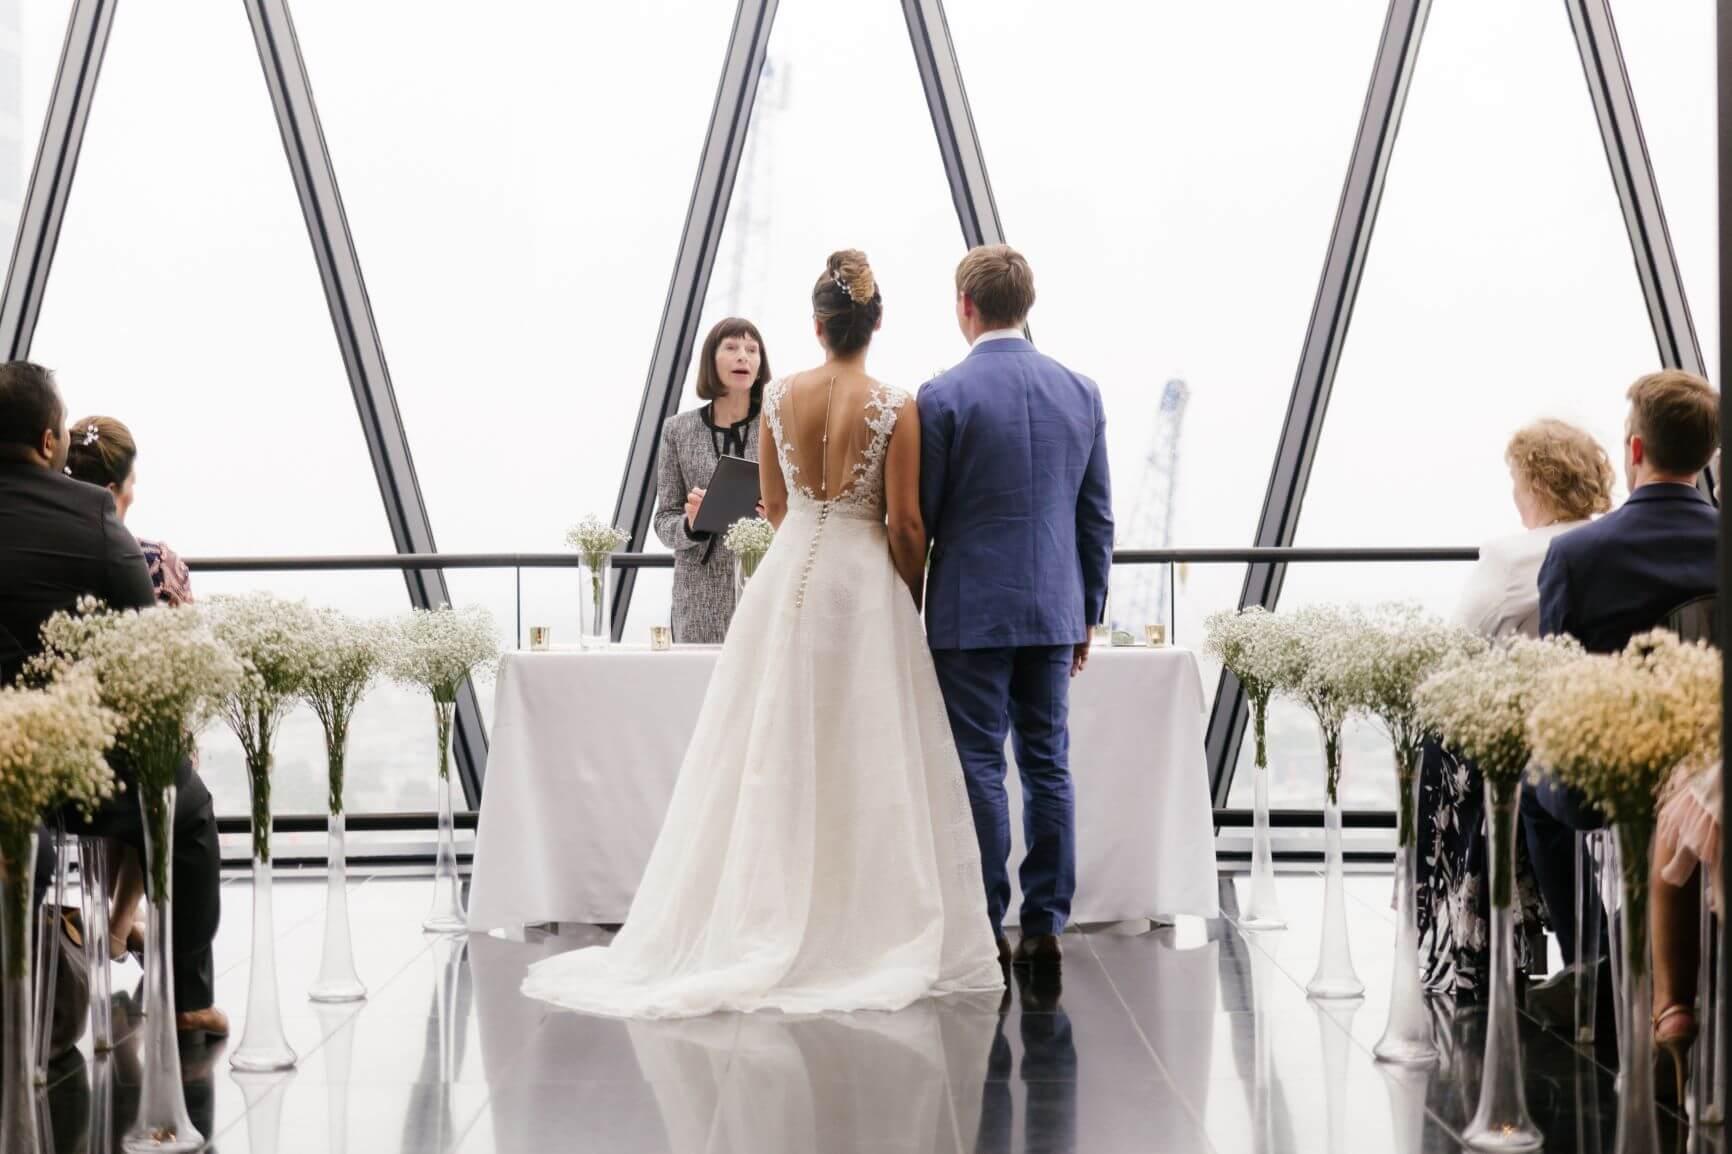 Searcys at The Gherkin Wedding Venue